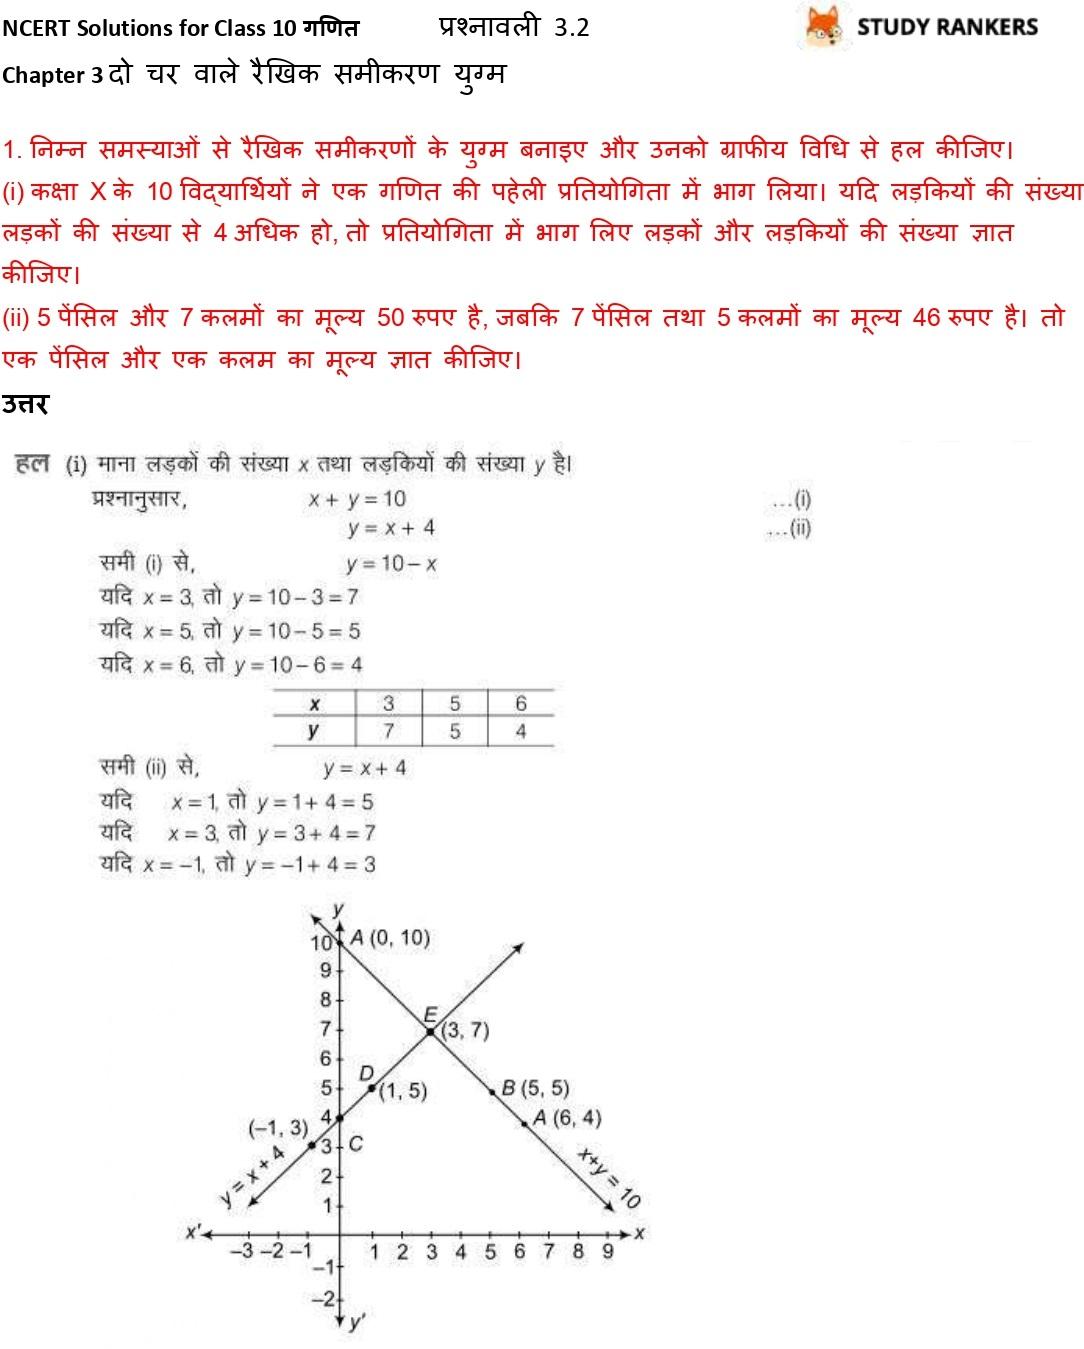 NCERT Solutions for Class 10 Maths Chapter 3 दो चर वाले रैखिक समीकरण युग्म प्रश्नावली 3.2 Part 1